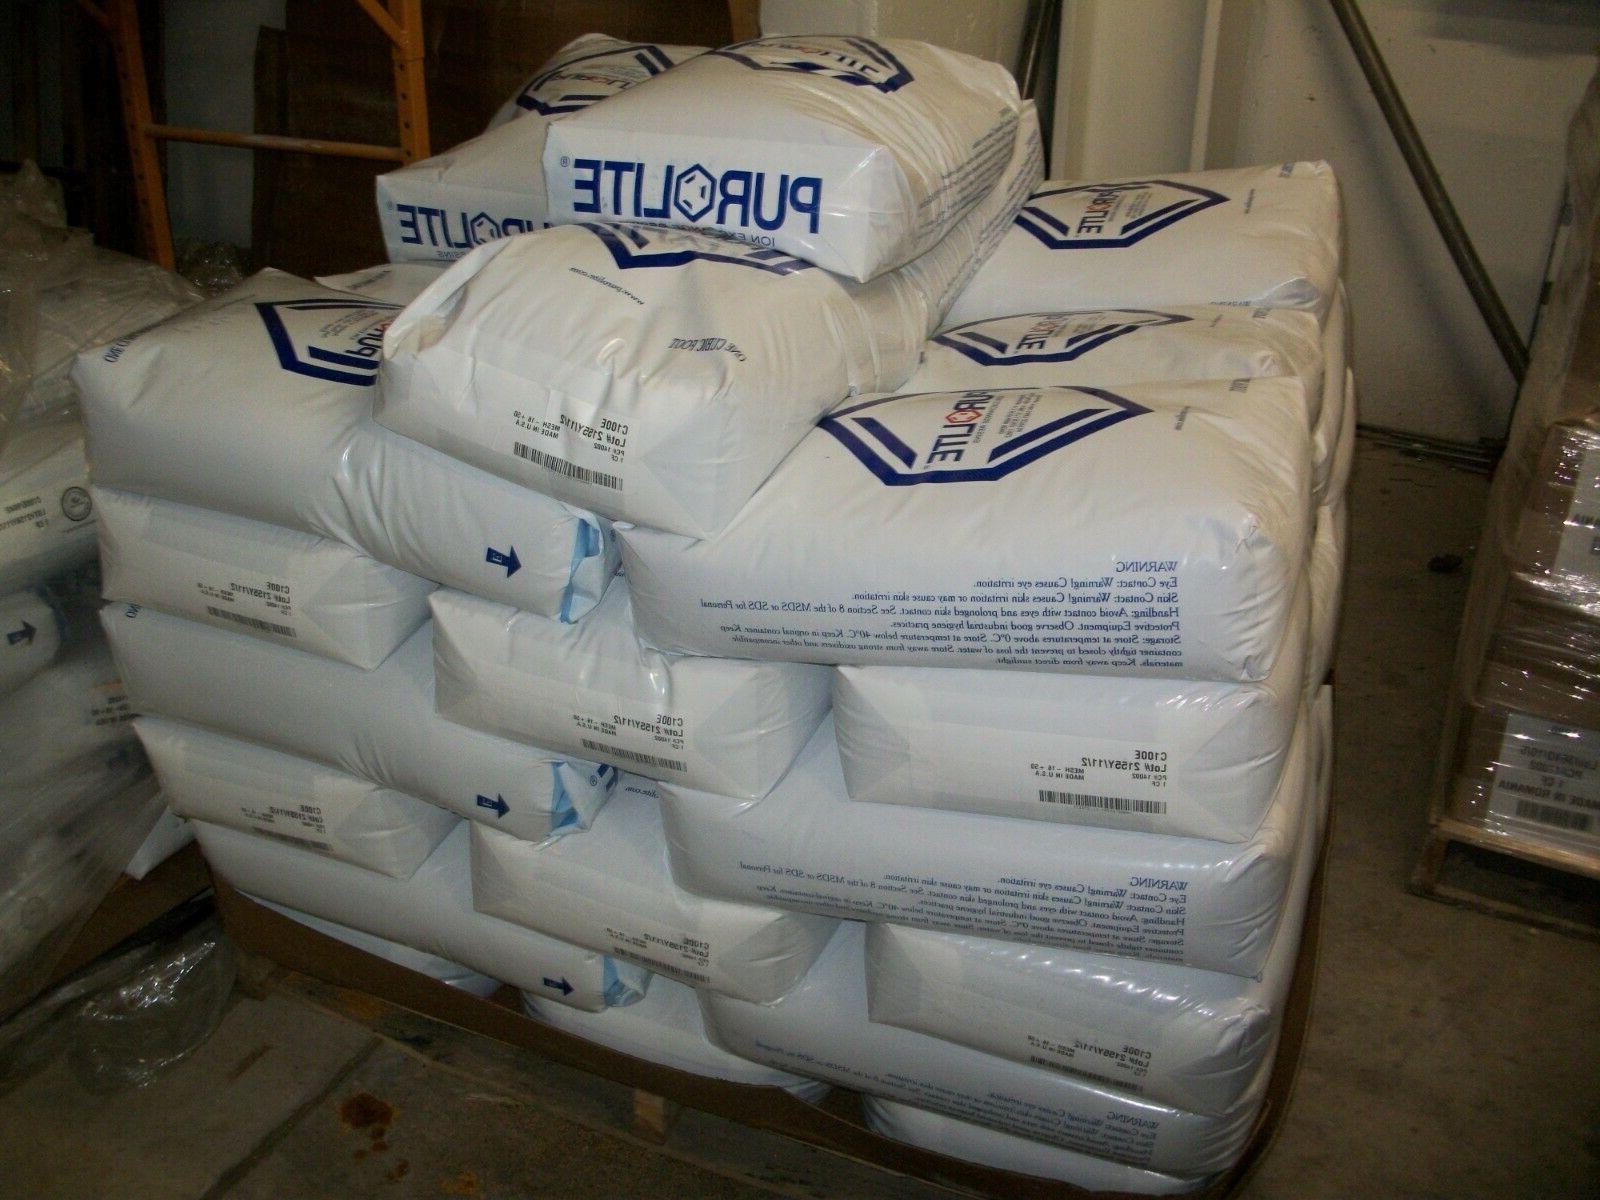 c100e water softener resin 1 cubic foot